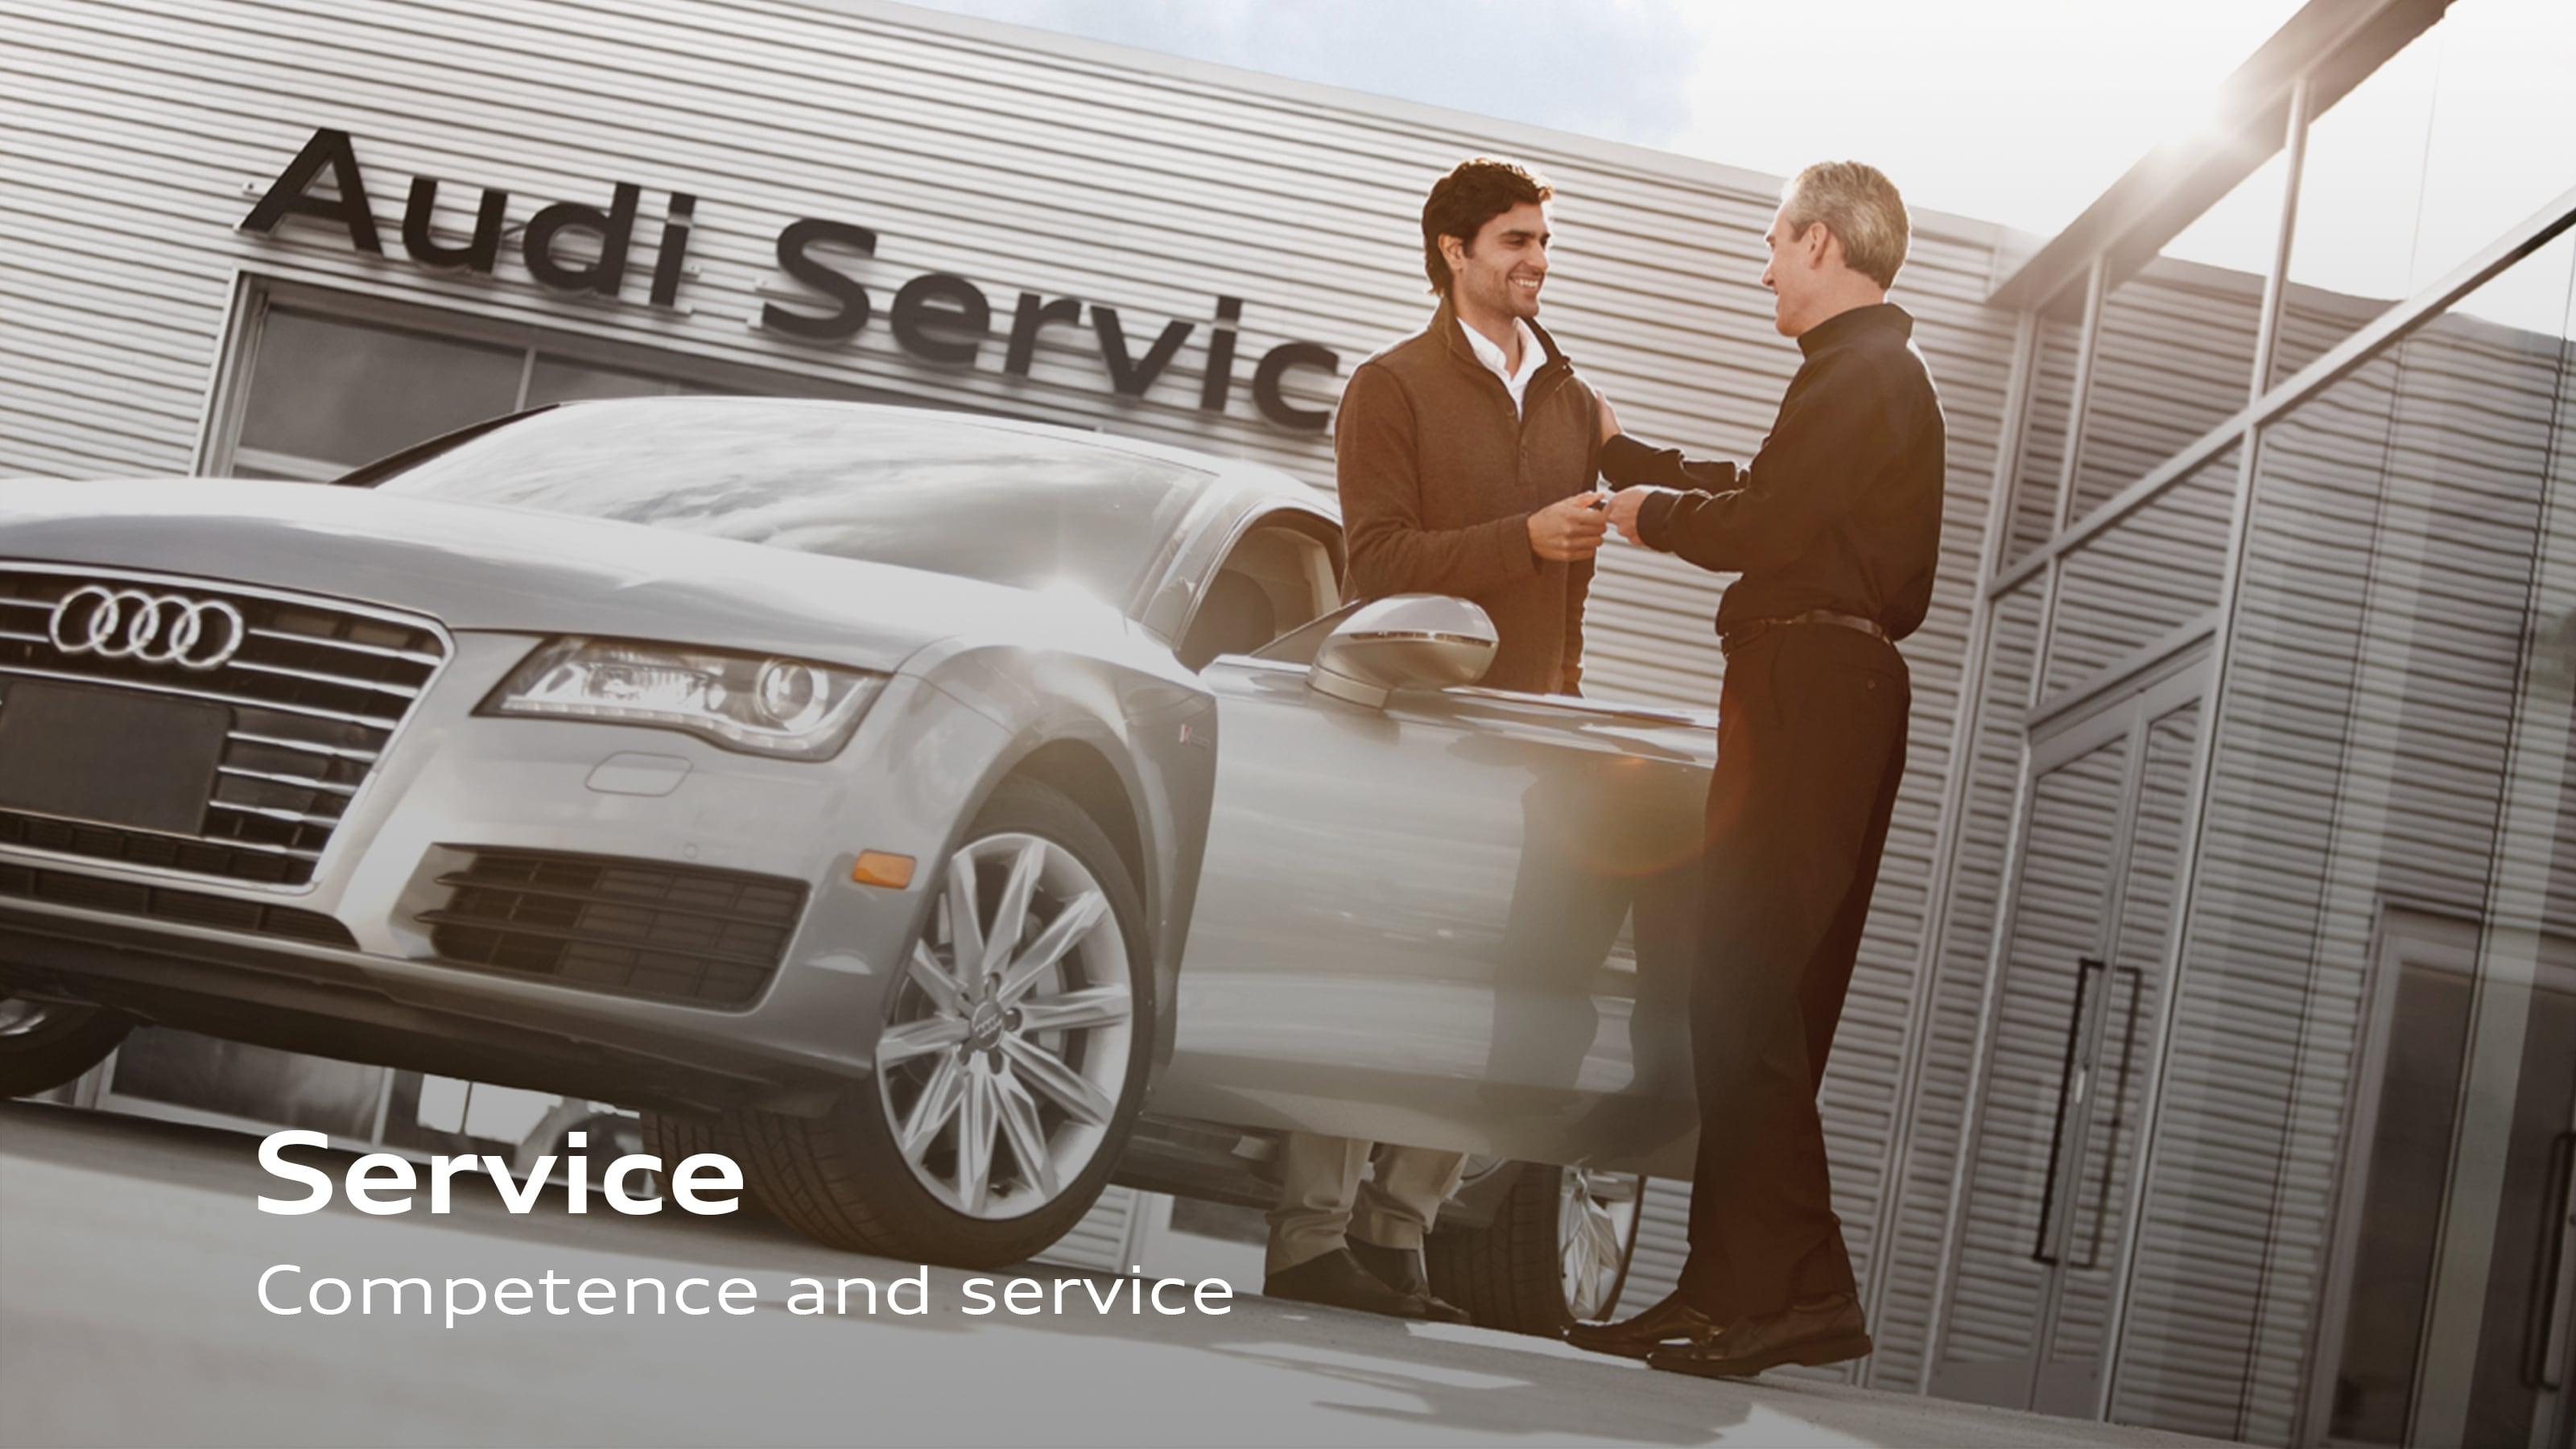 Dealer Facility - Audi car dealership